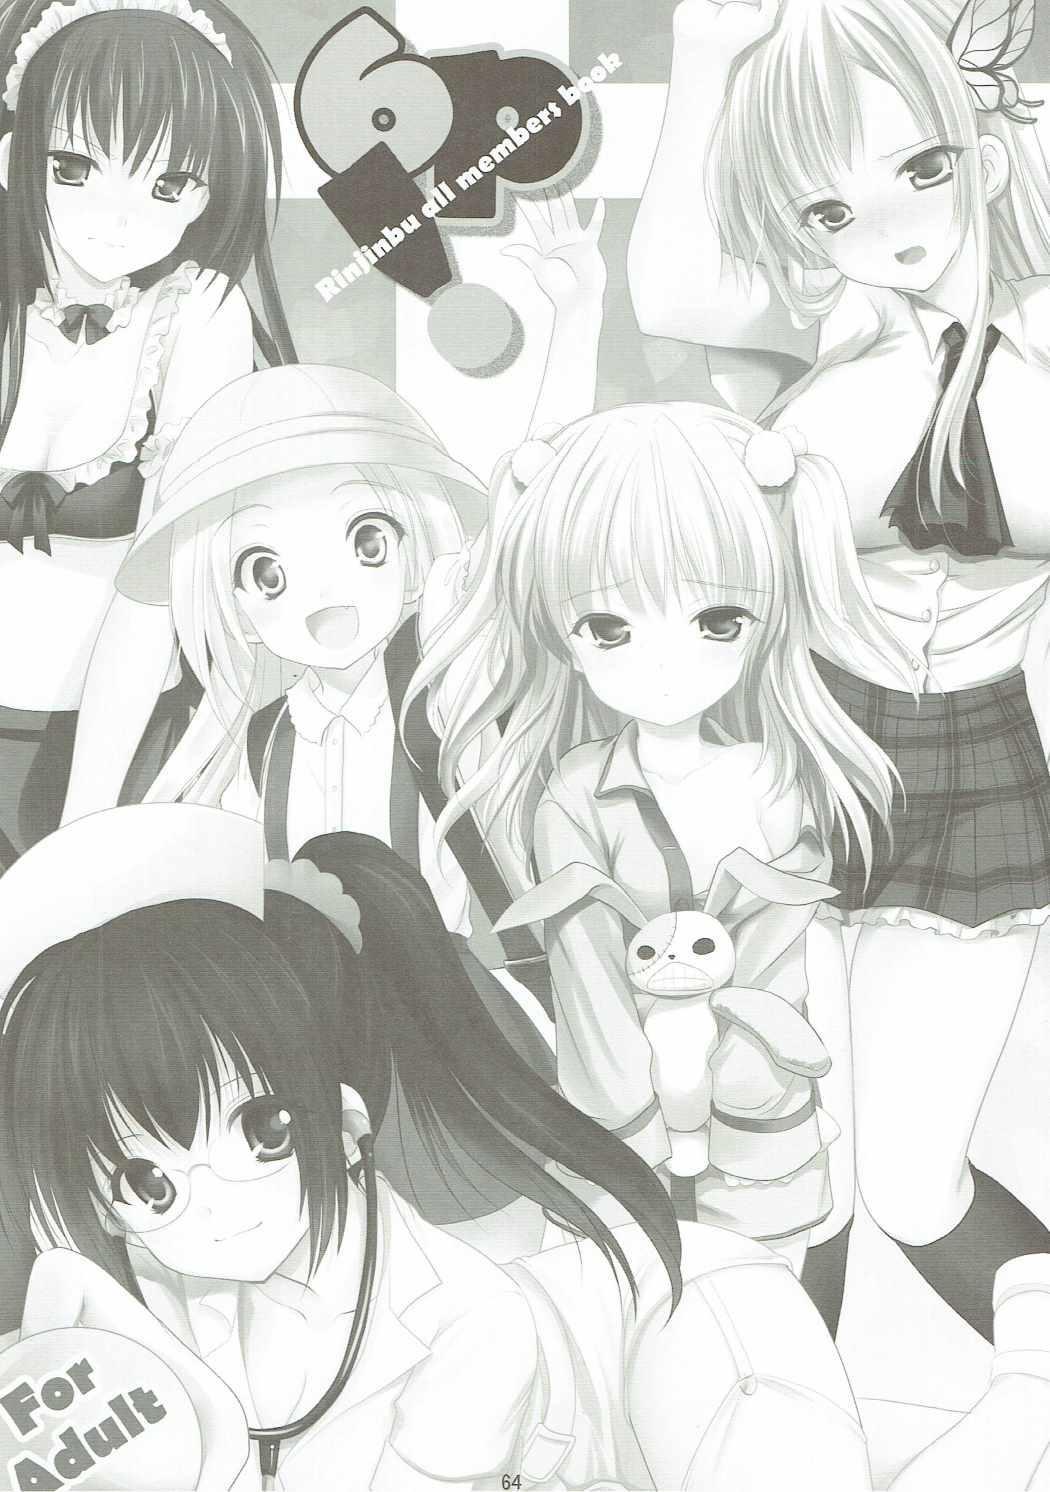 ANIME COLLECTION Imomuya Honpo - Singleton Anime Soushuuhen 62